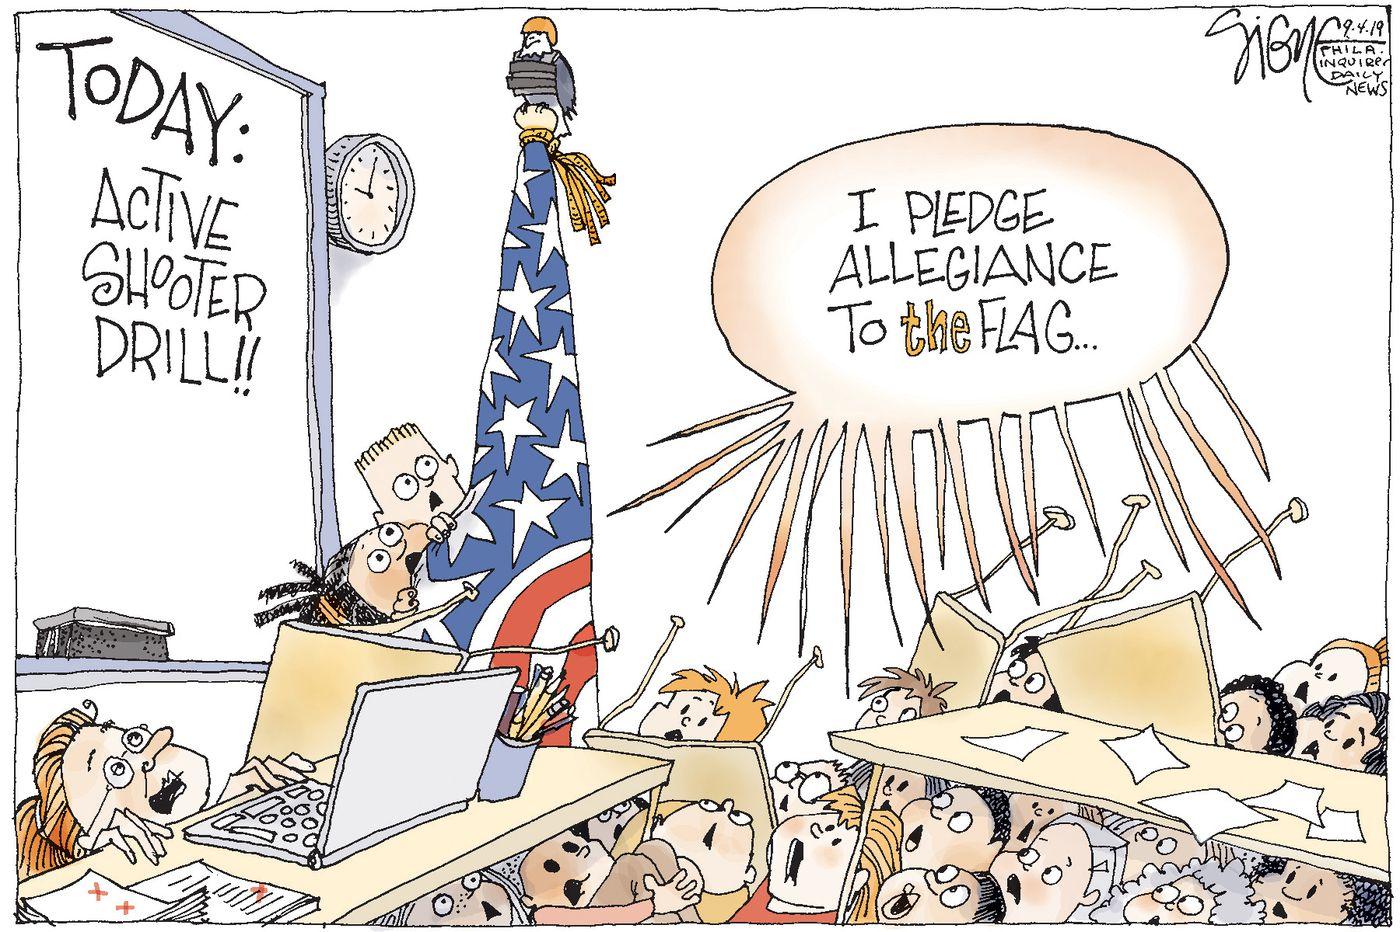 Political Cartoon: Elementary active shooter drill